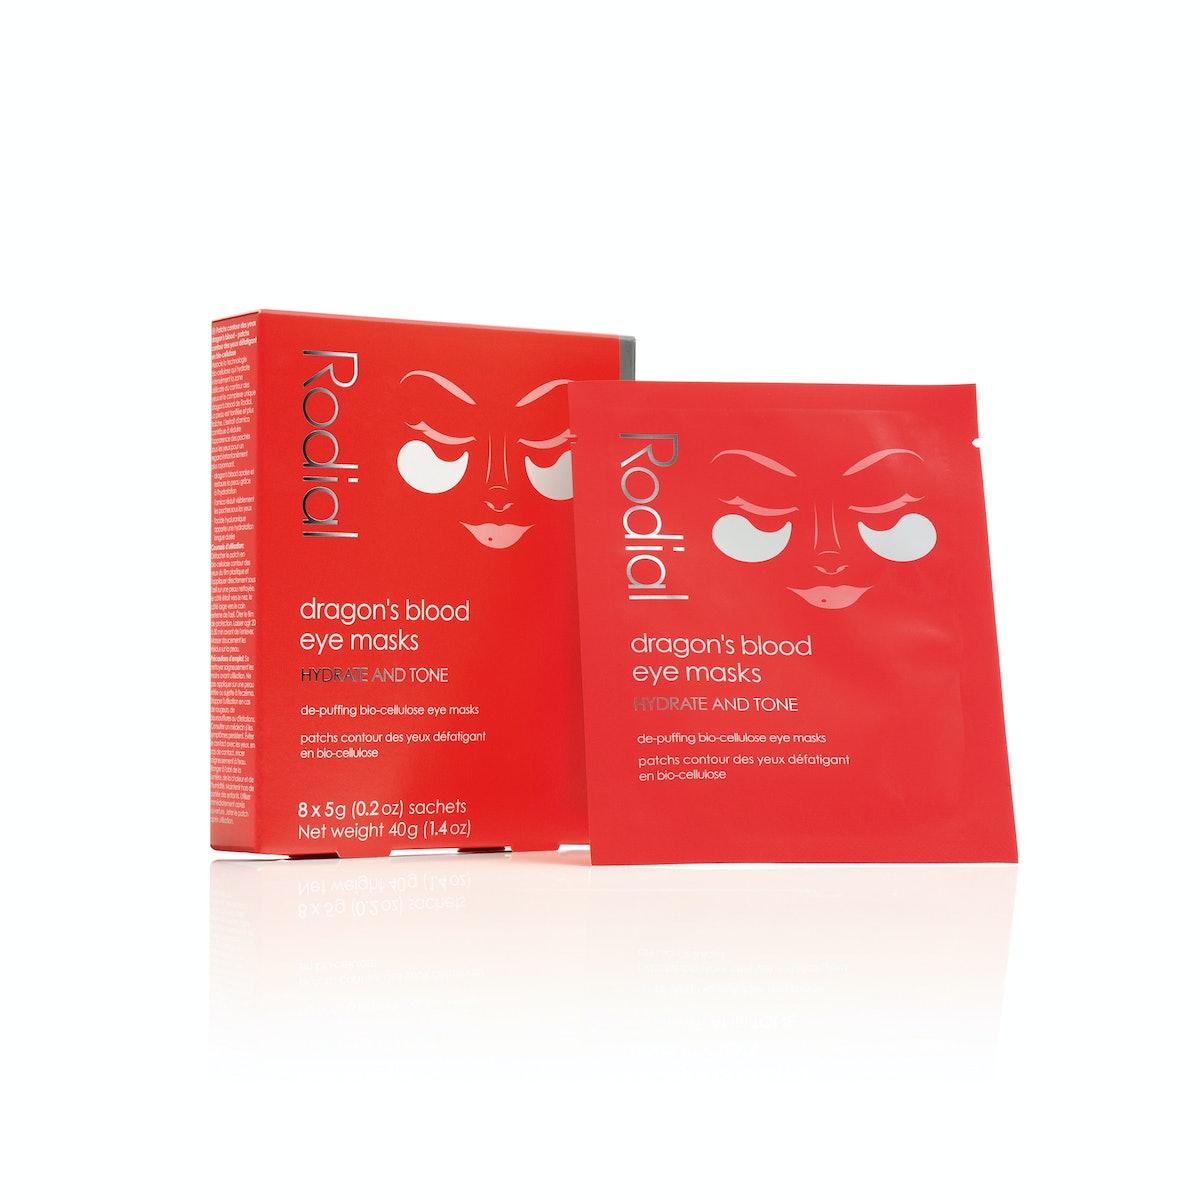 Rodial-Dragons-Blood-Eye-Masks.jpg